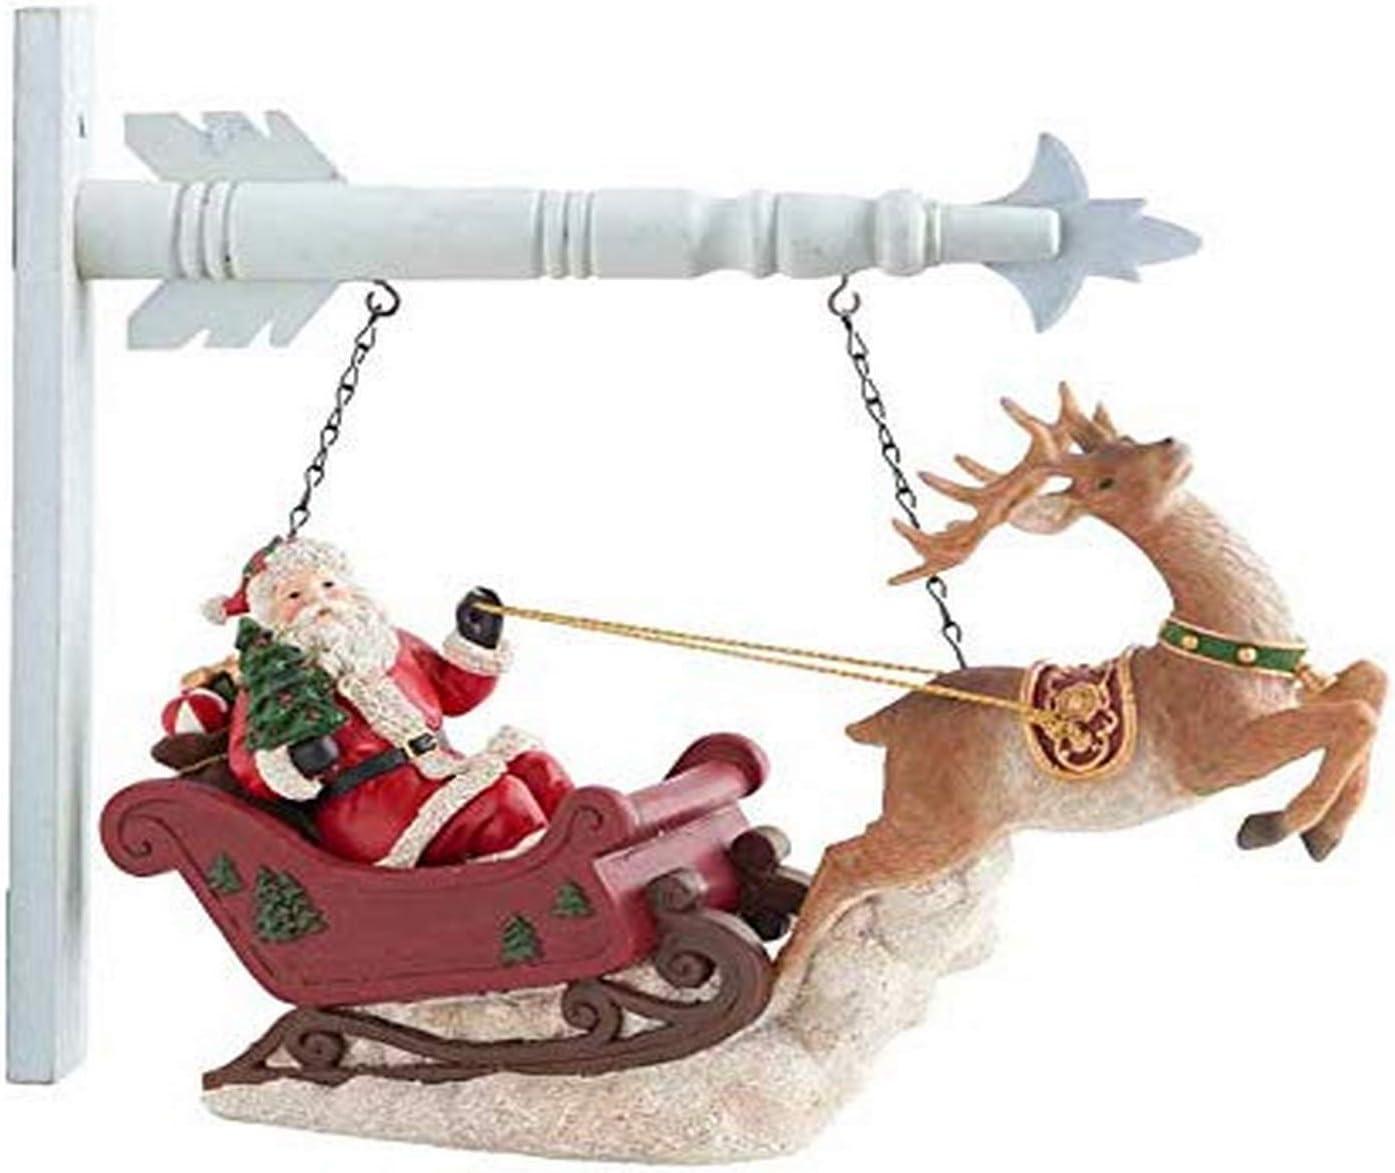 KK Interiors 53088A-AR Resin Santa Riding R Sales for sale w Deer Arrow 67% OFF of fixed price Sleigh